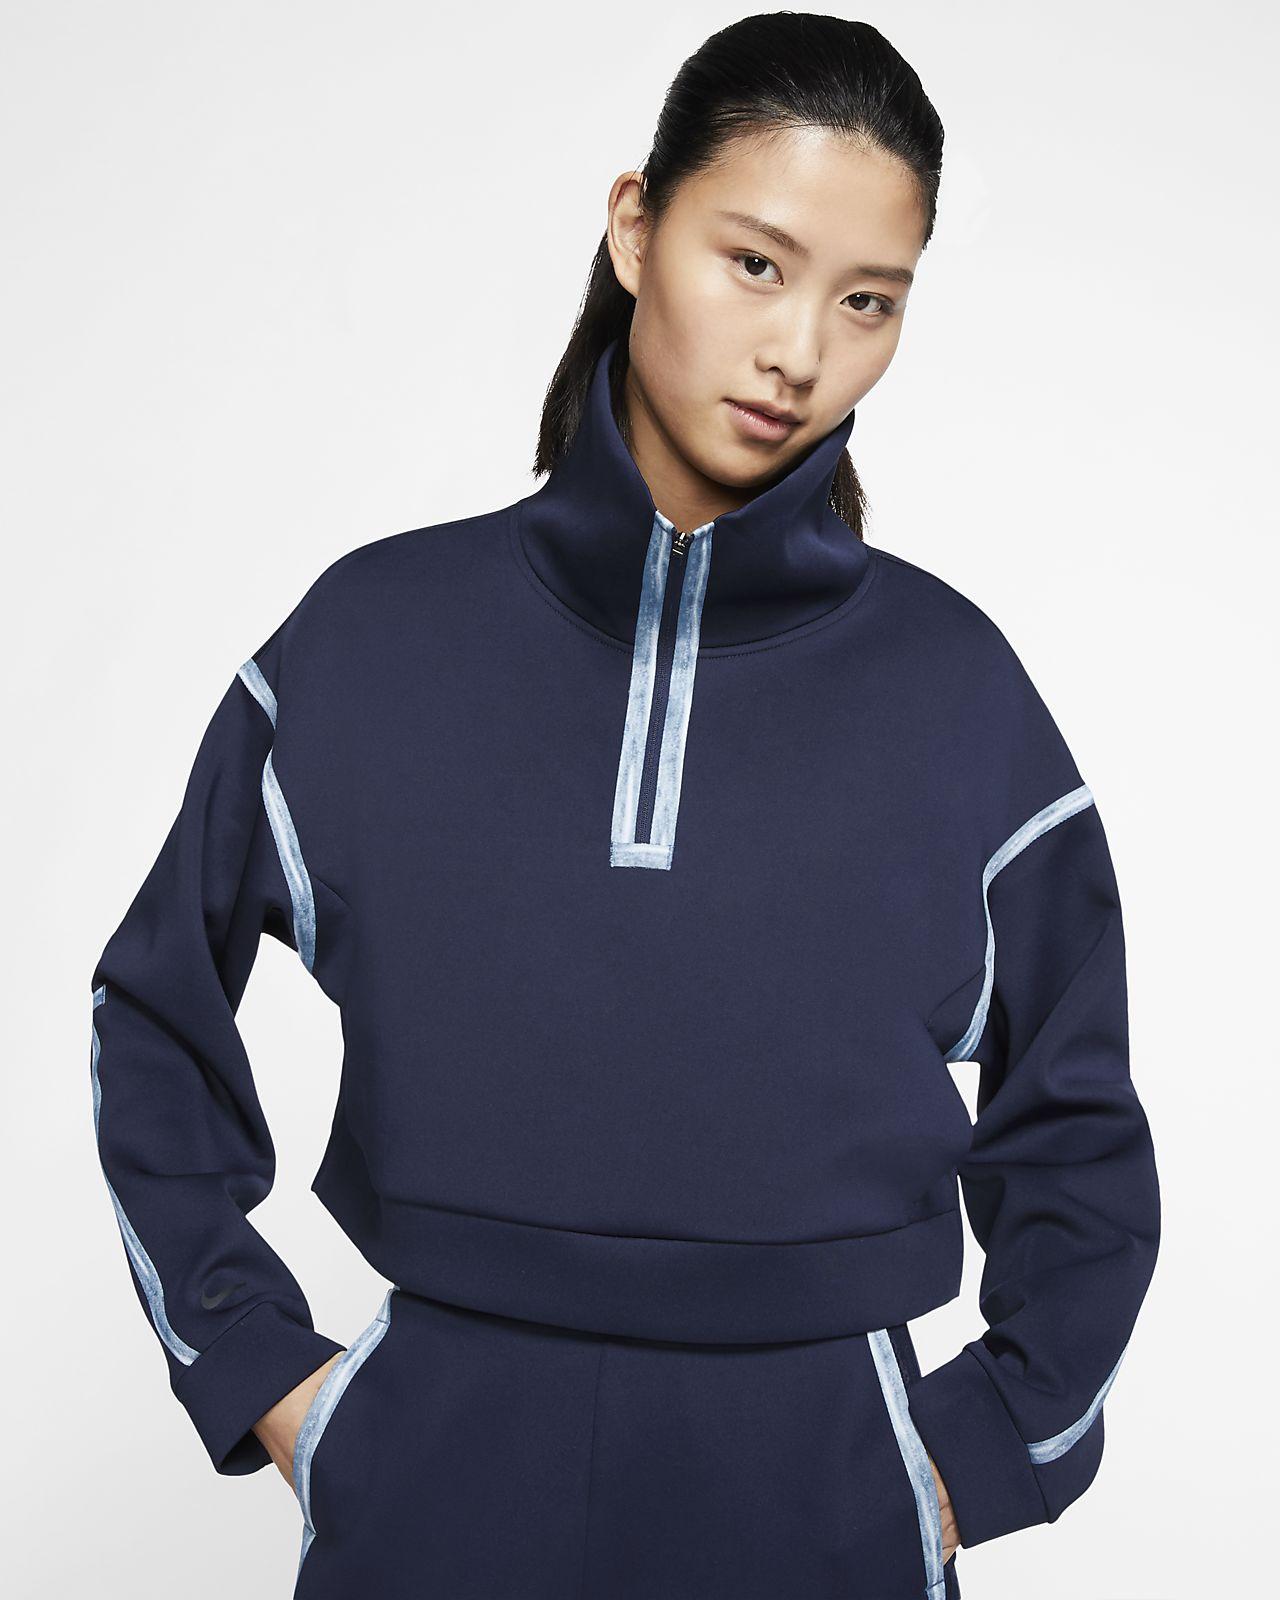 b025374d037 Γυναικείο φλις φούτερ προπόνησης με φερμουάρ στο 1/4 του μήκους Nike City  Ready